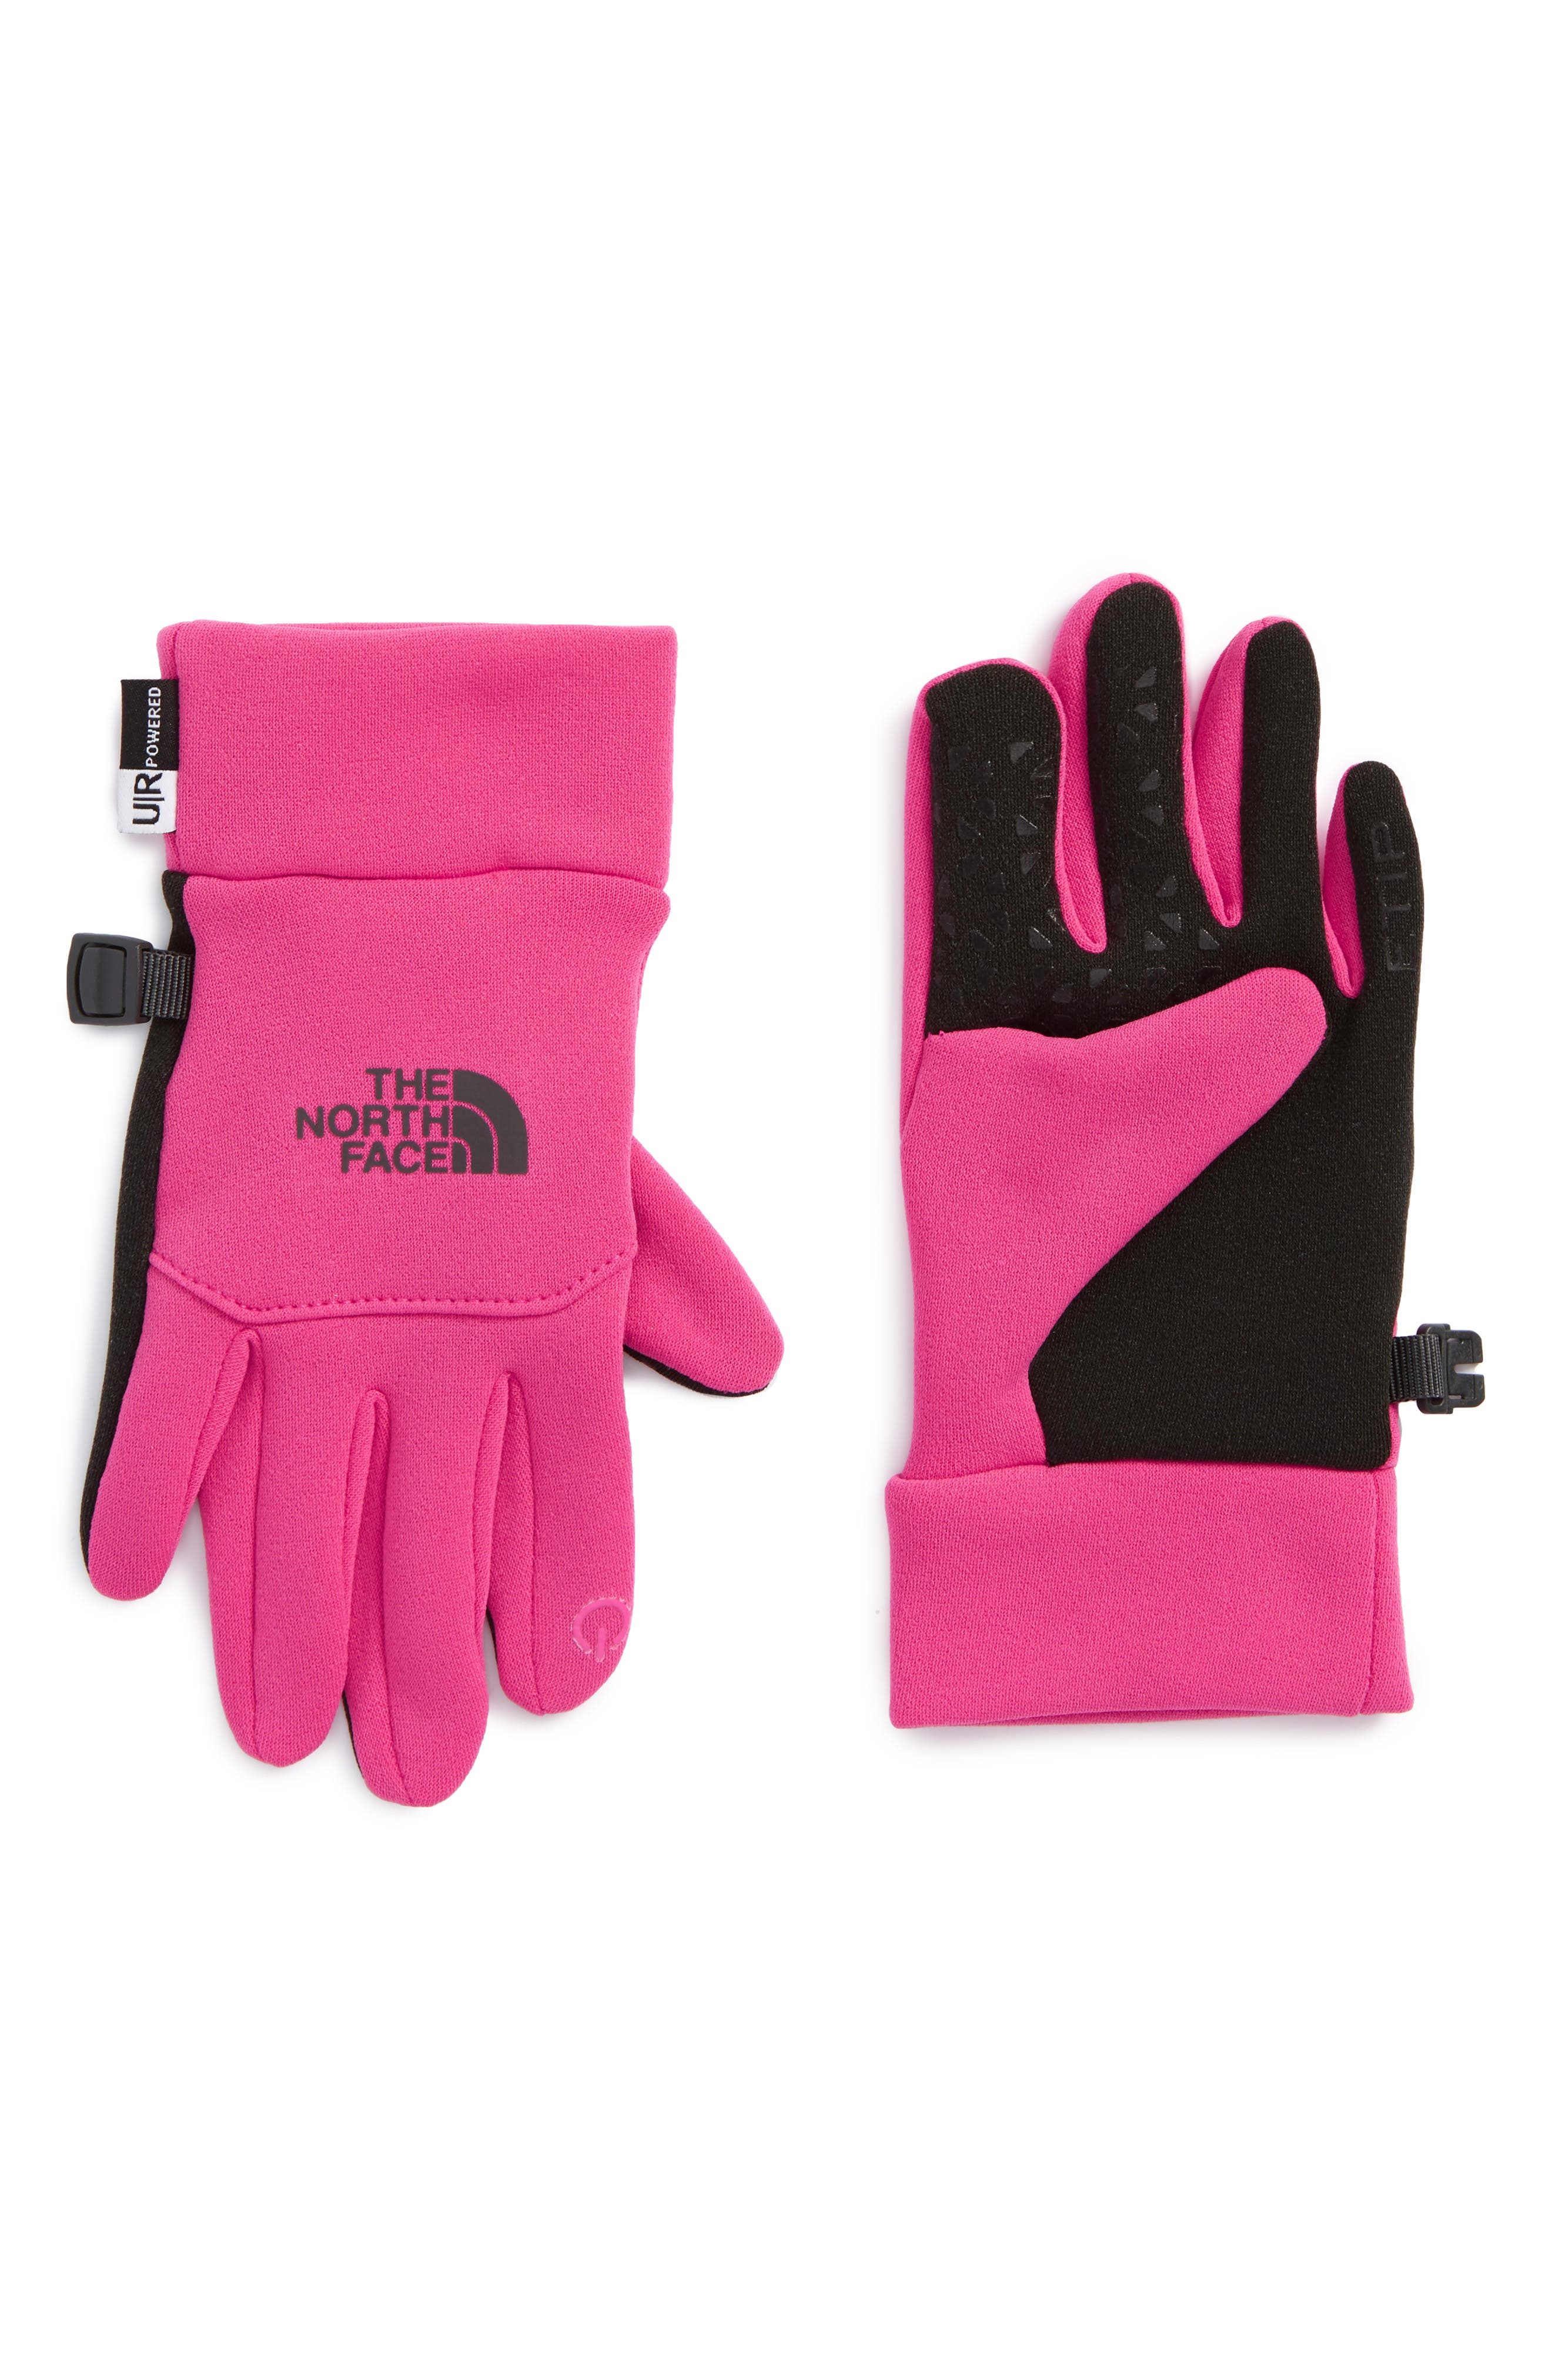 E-Tip Gloves,                             Main thumbnail 1, color,                             Petticoat Pink